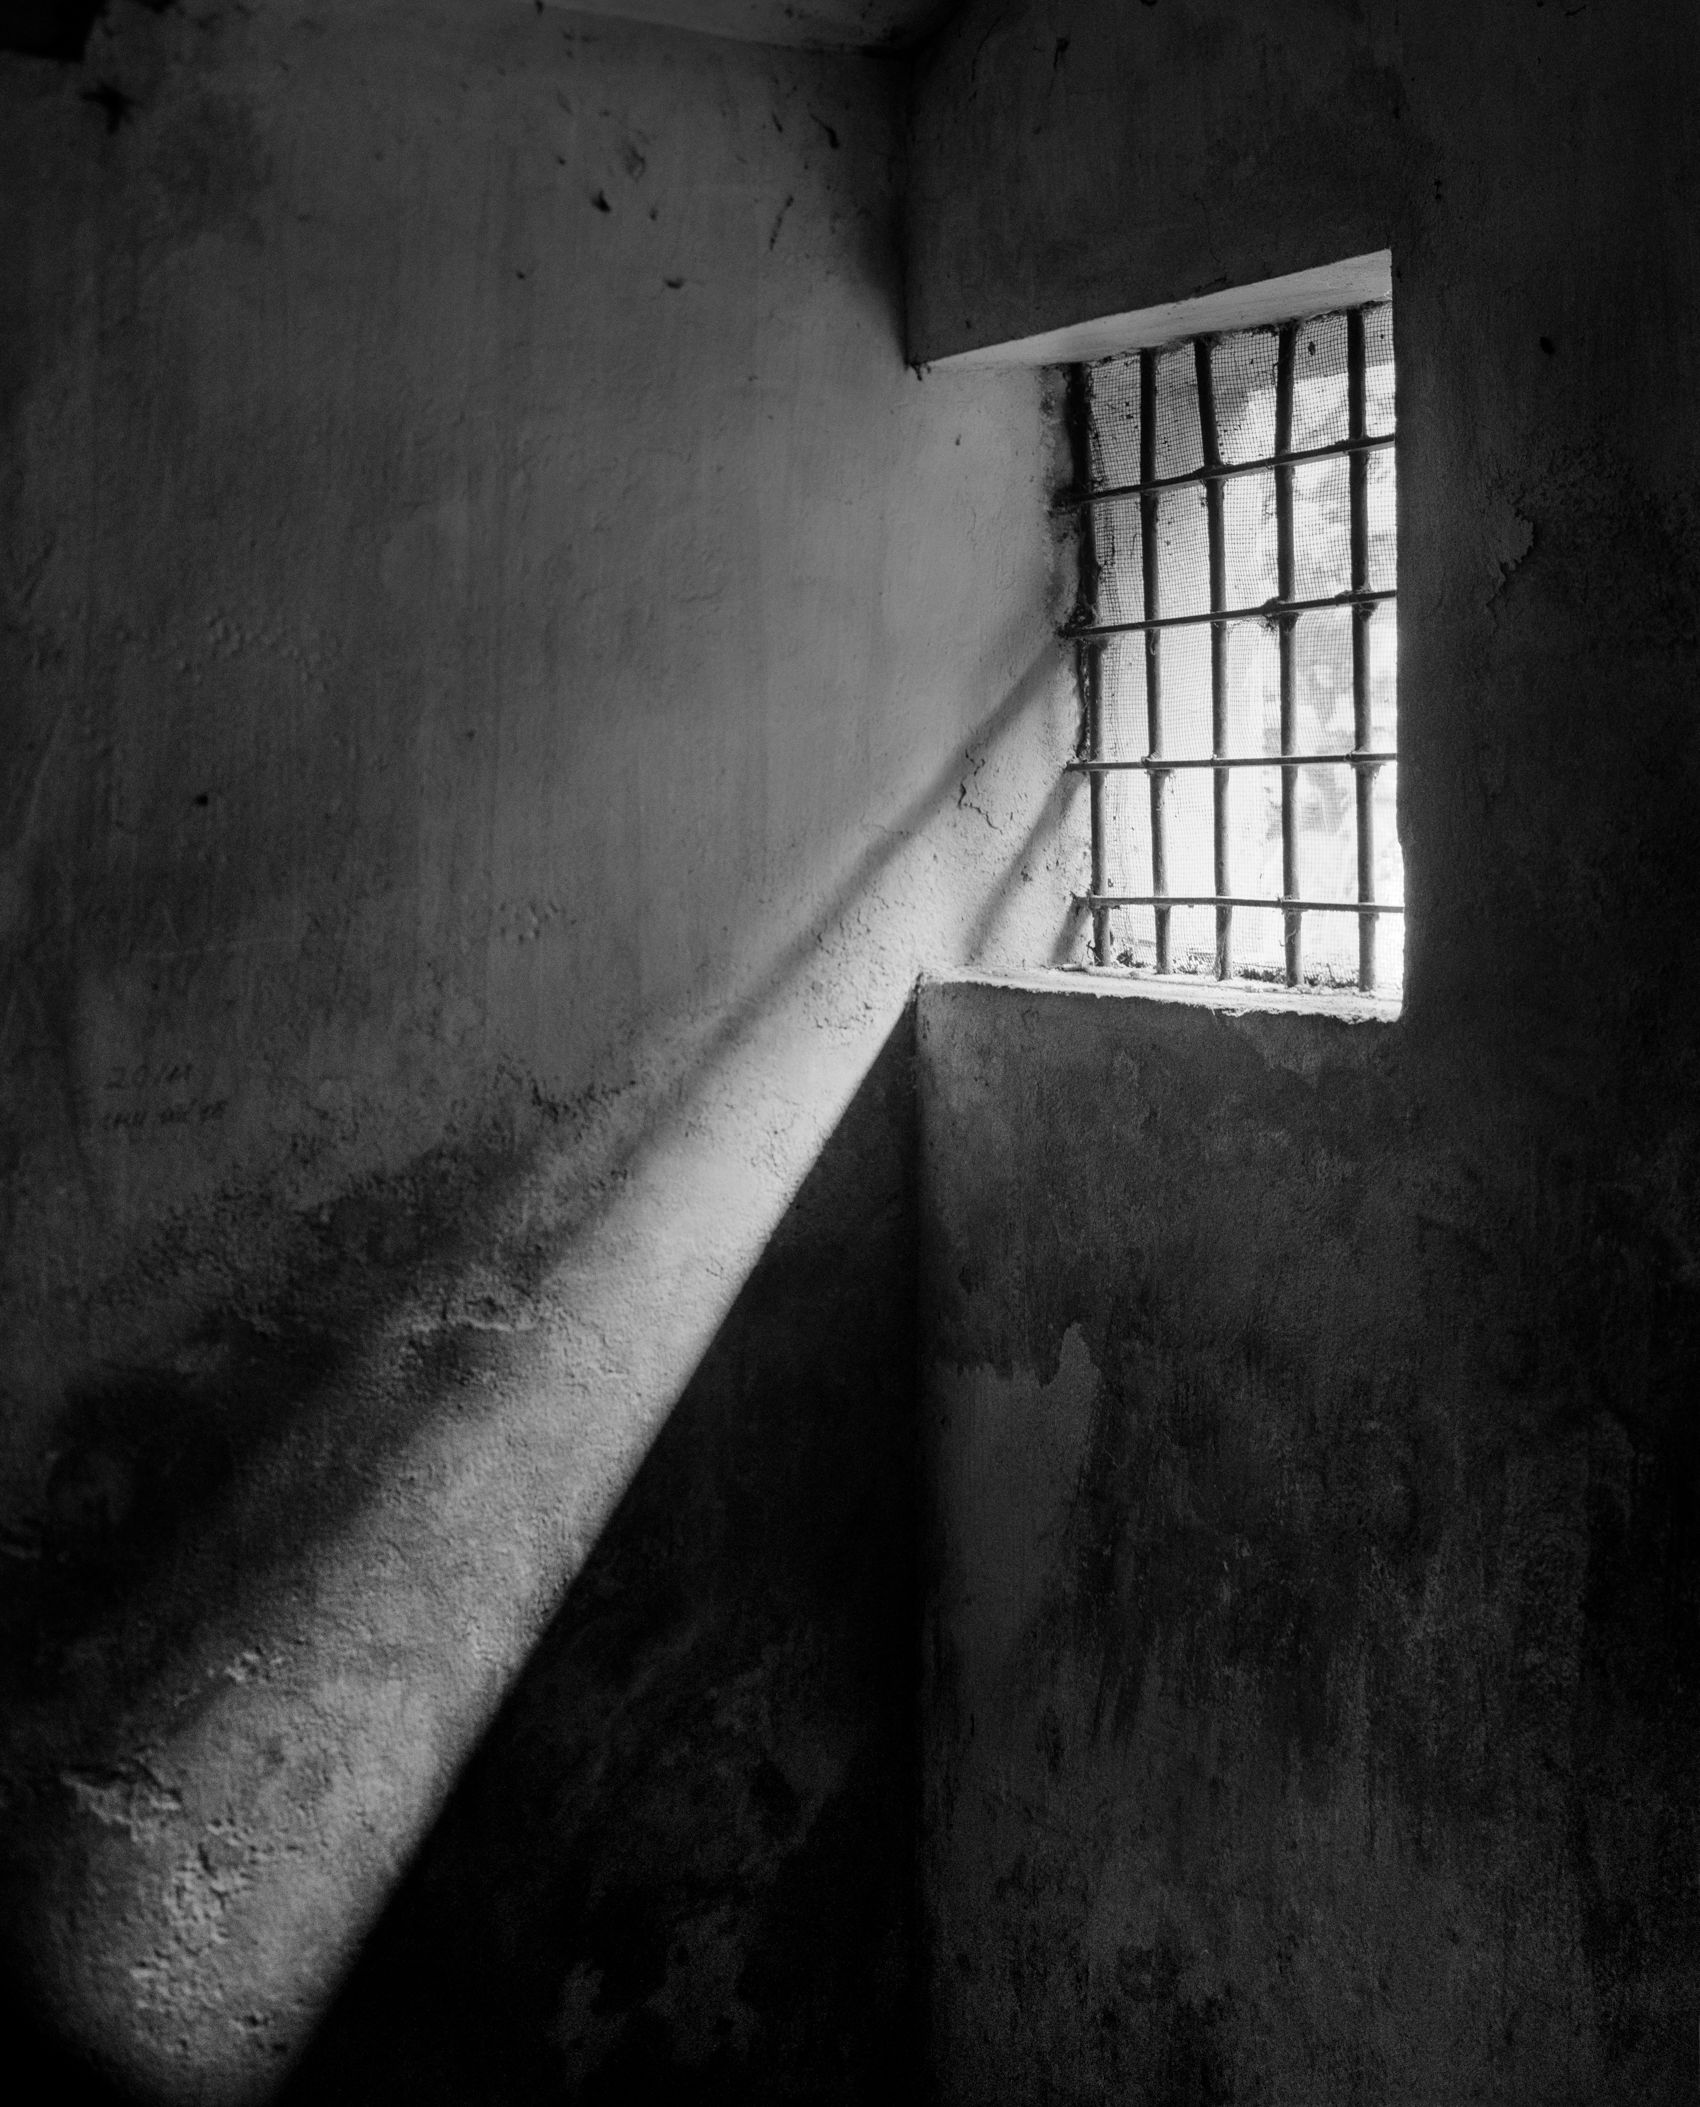 Solitary Prison Cell, Hanoi